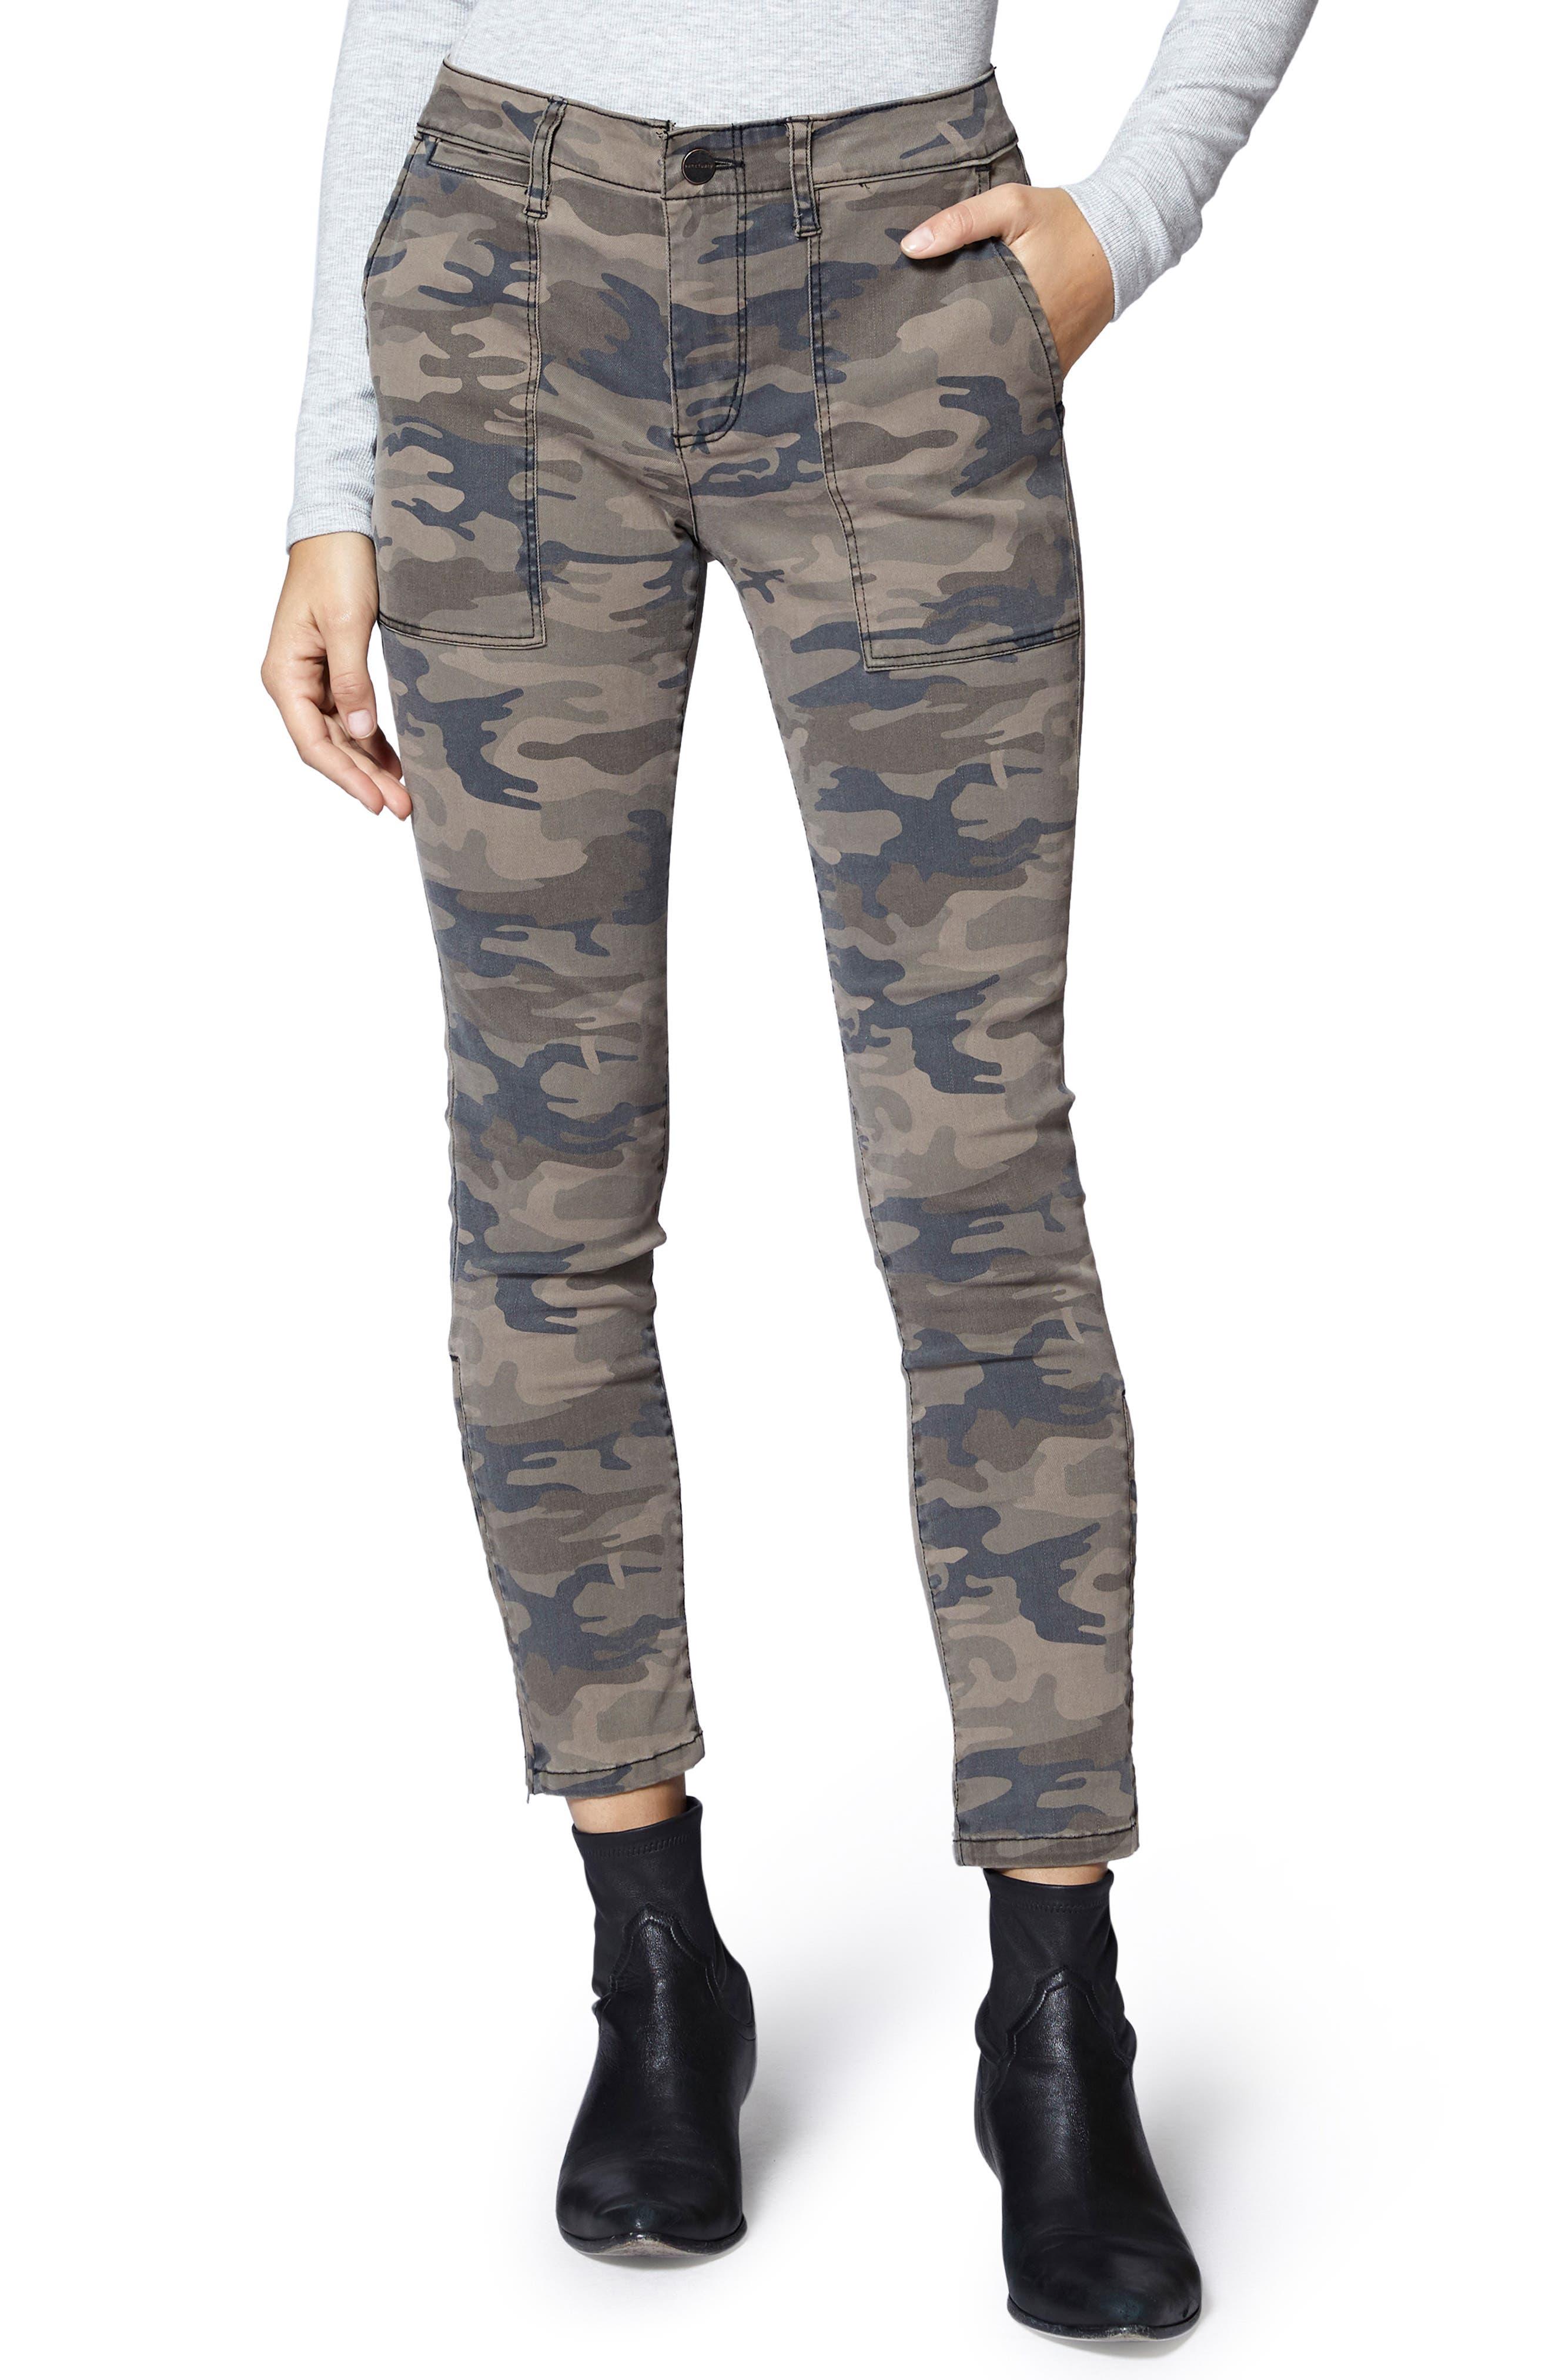 Fast Track Skinny Chino Pants,                         Main,                         color, HUMAN NATURE CAMO